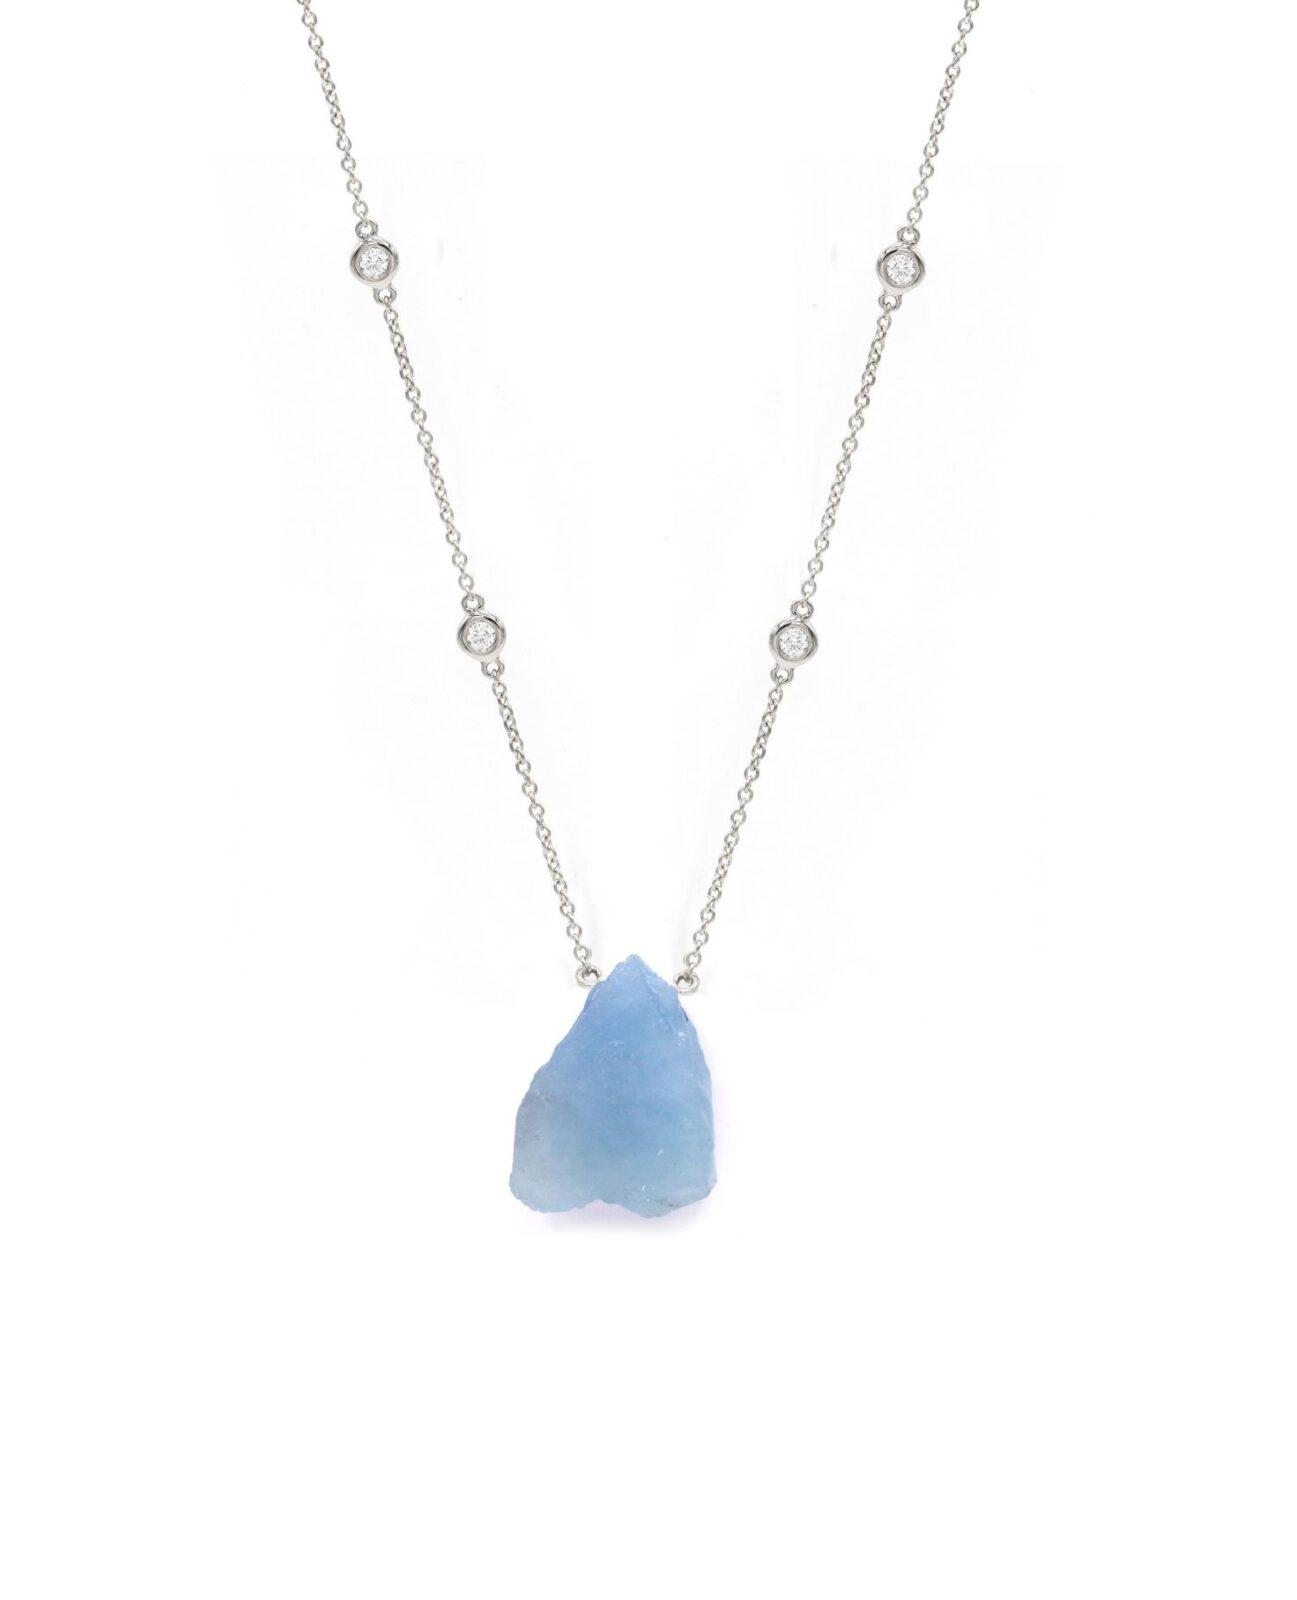 Aquamarine Rough Crystal Necklace